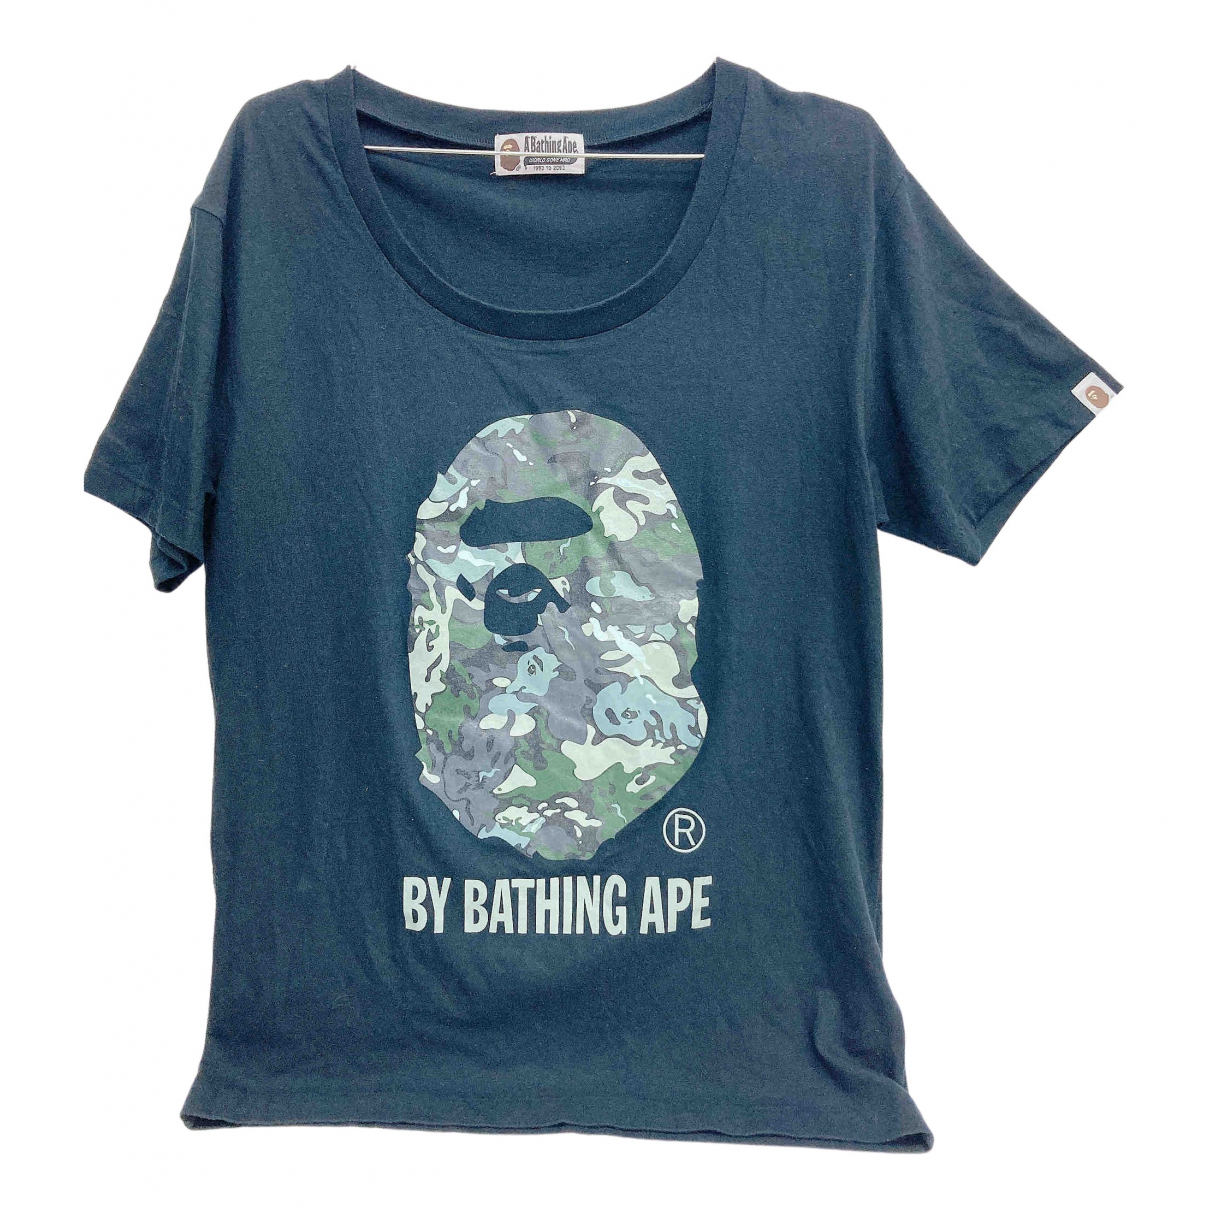 Camiseta A Bathing Ape